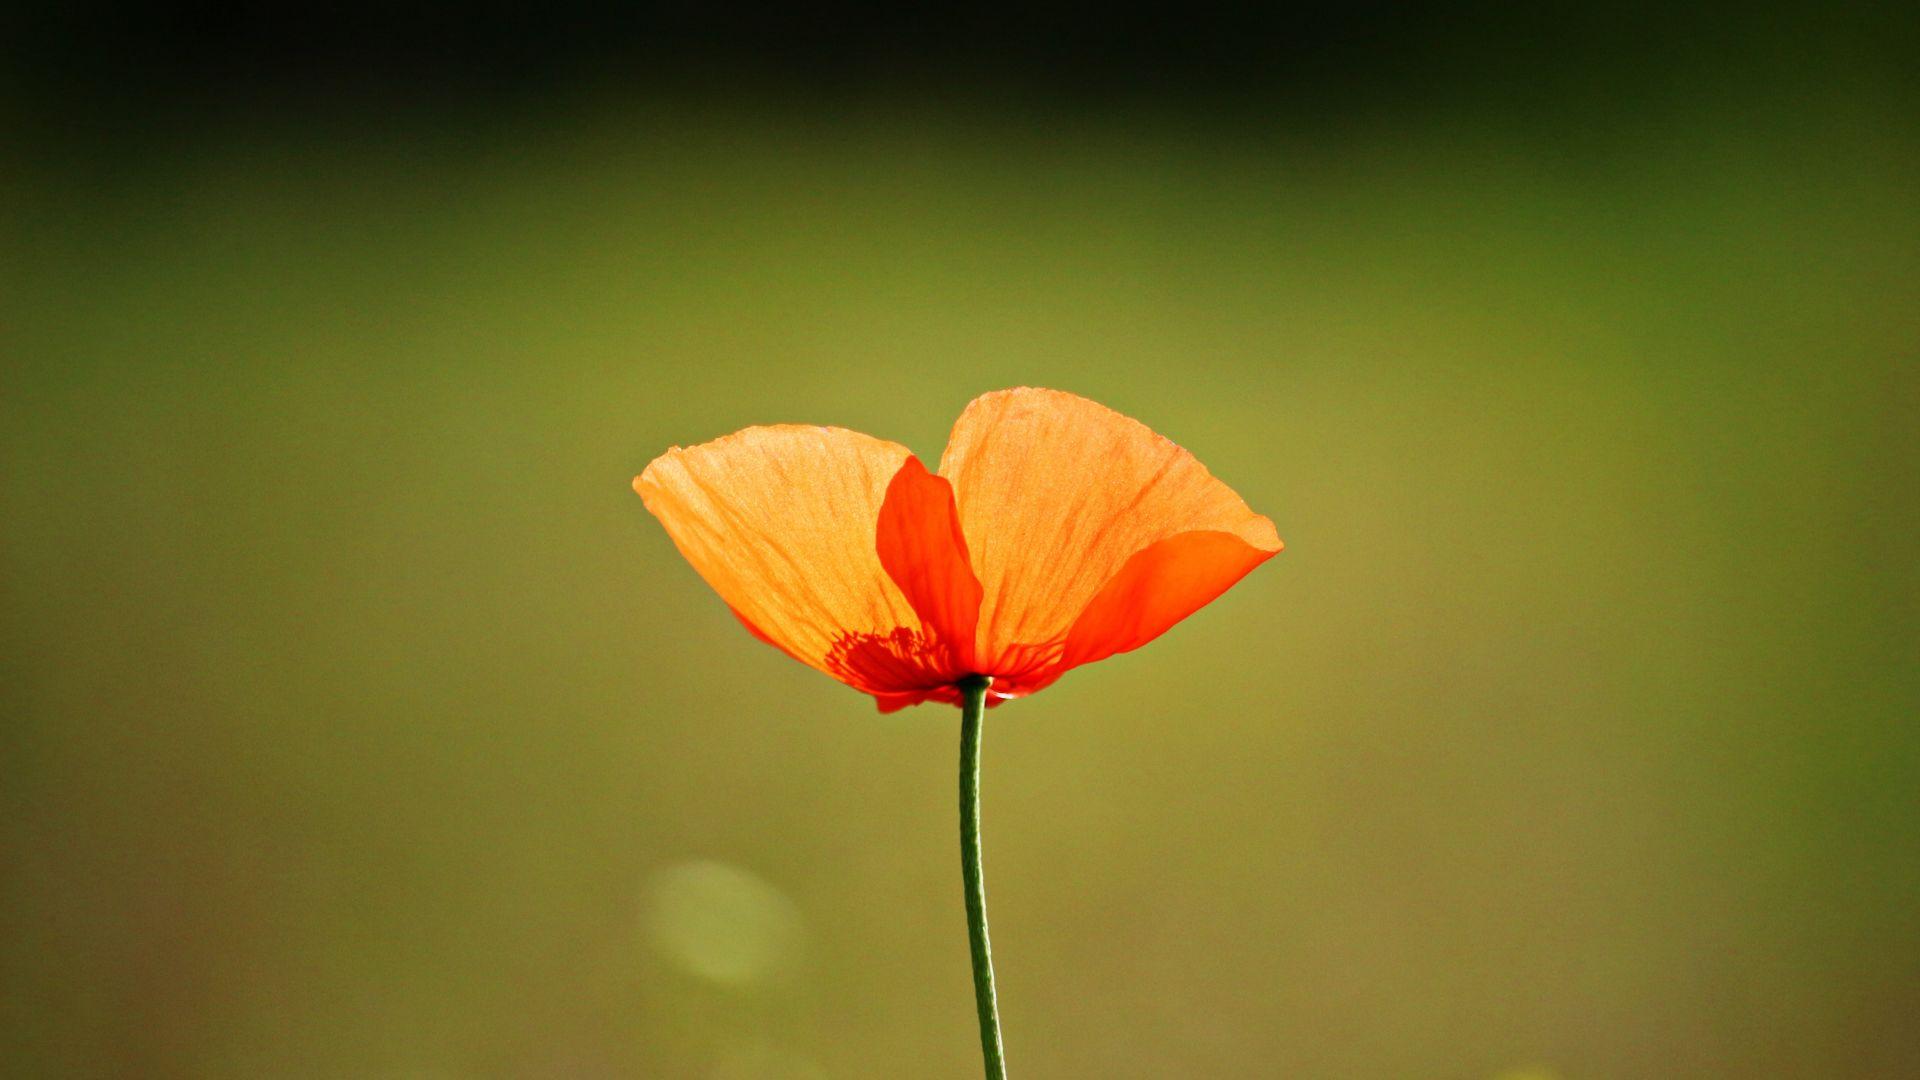 Wallpaper Single flower, orange poppy, blur